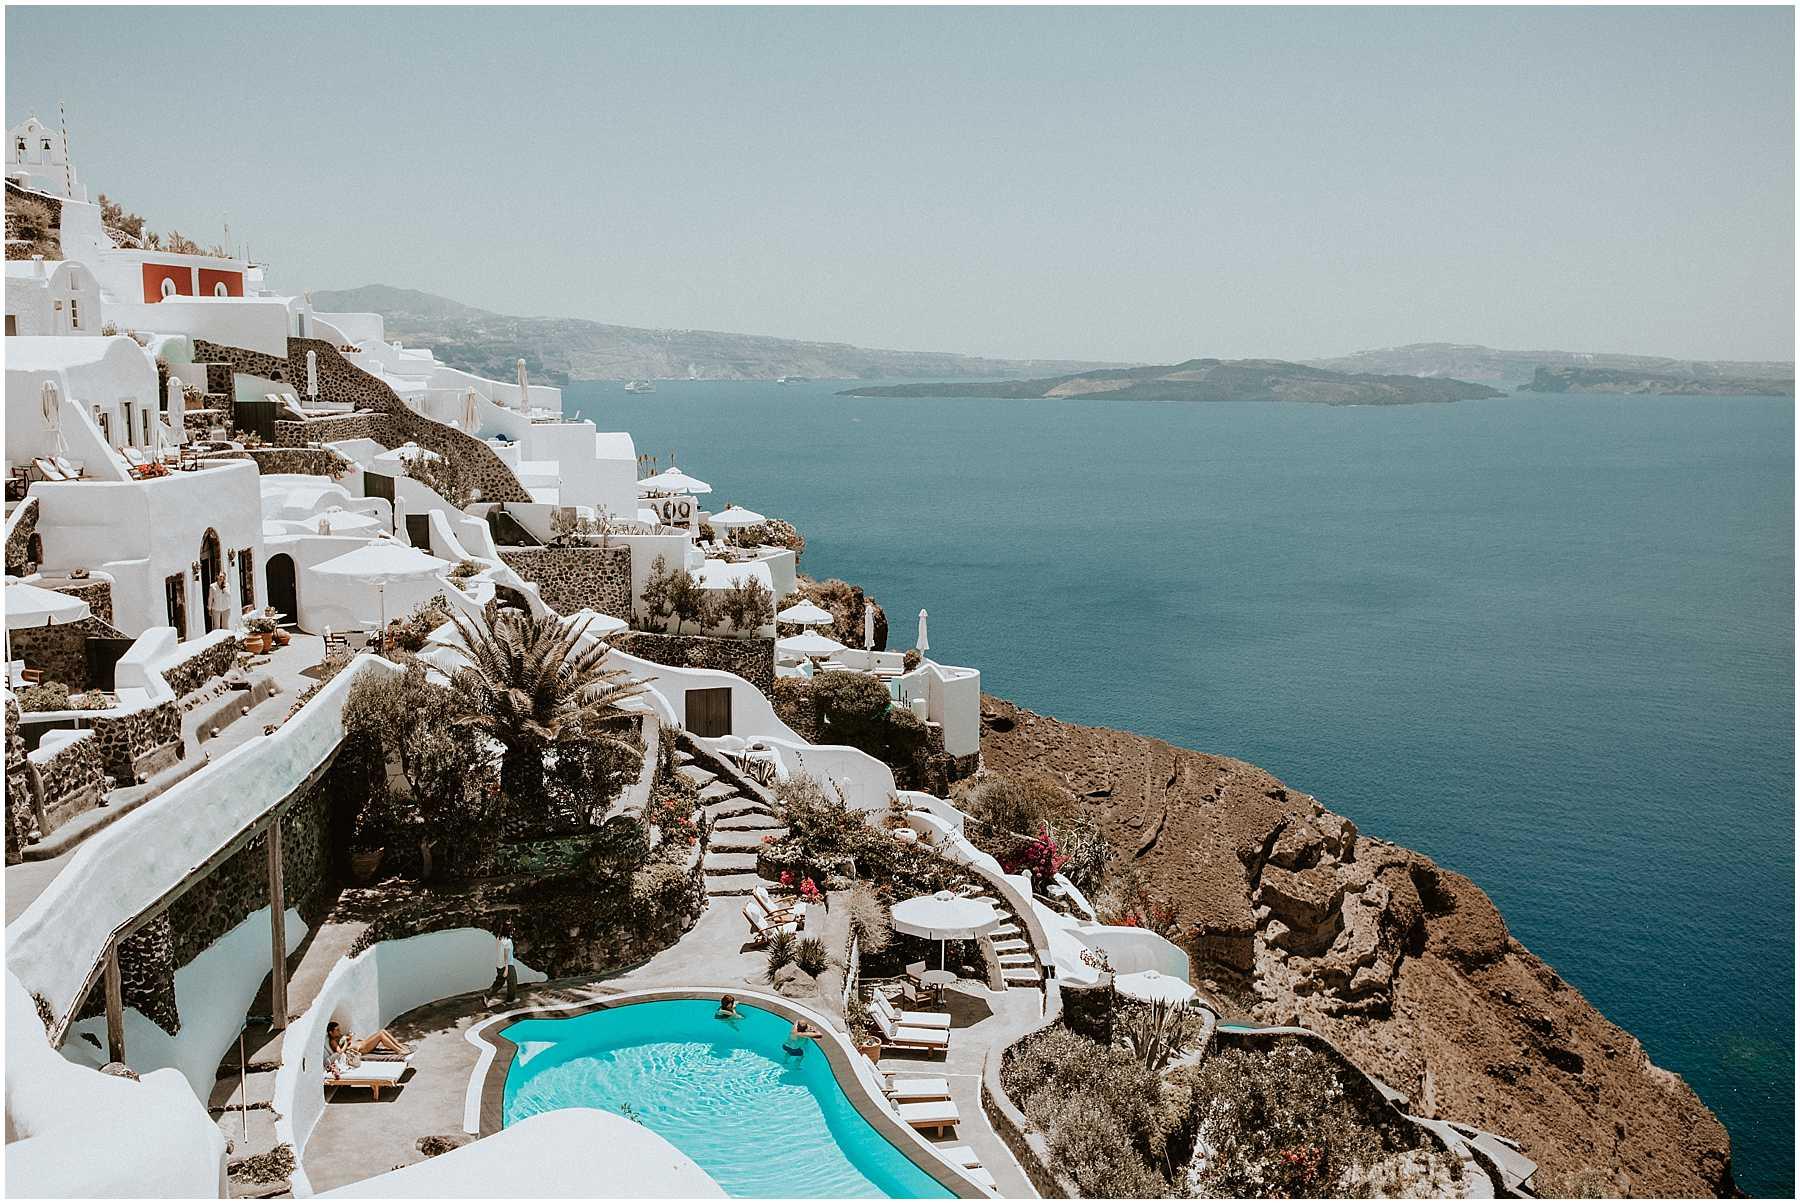 Cliffside views of Oia in Santorini Greece